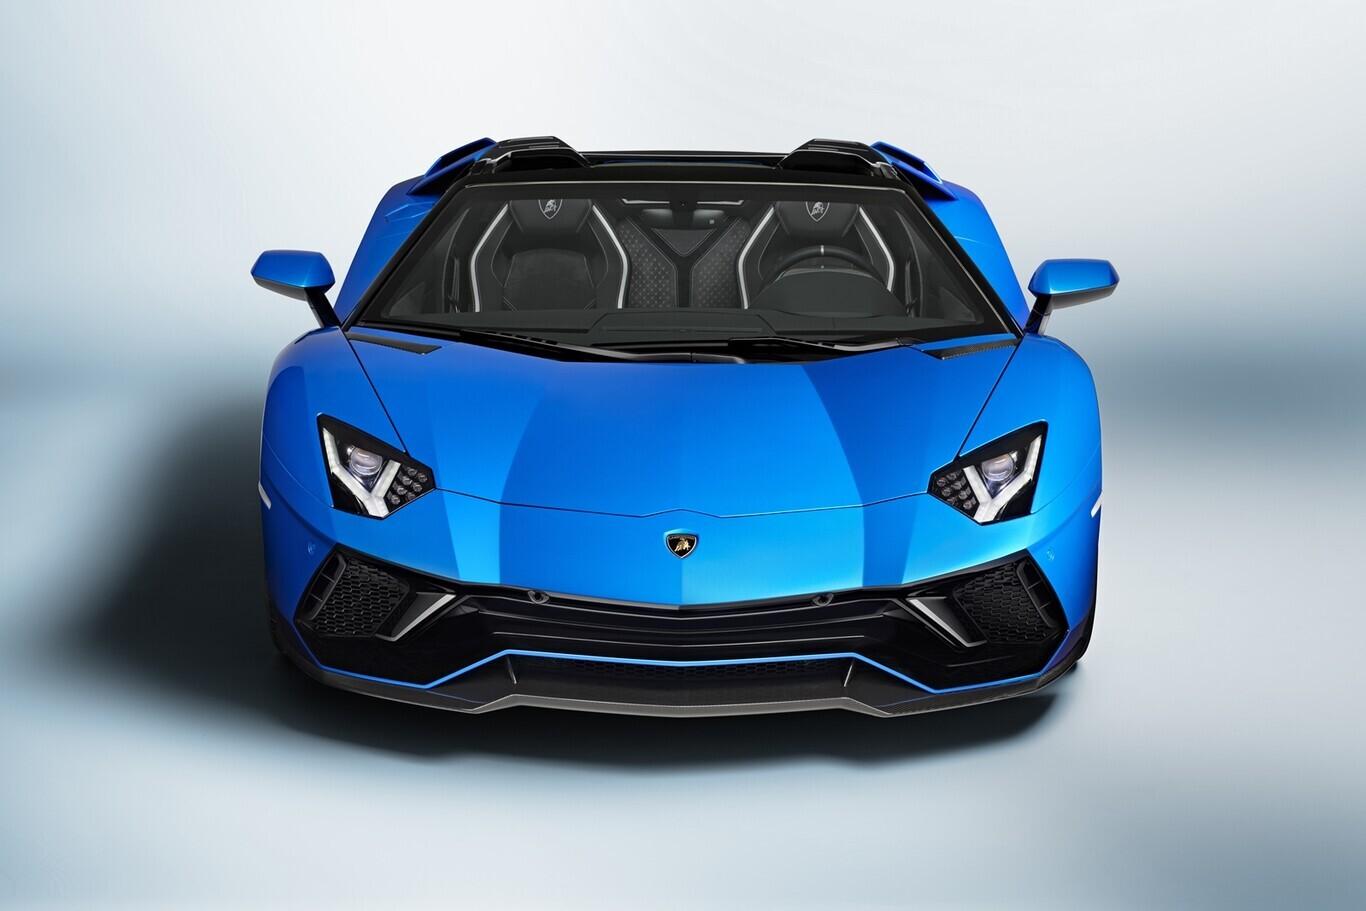 Foto de Lamborghini Aventador LP780-4 Ultimae (13/18)